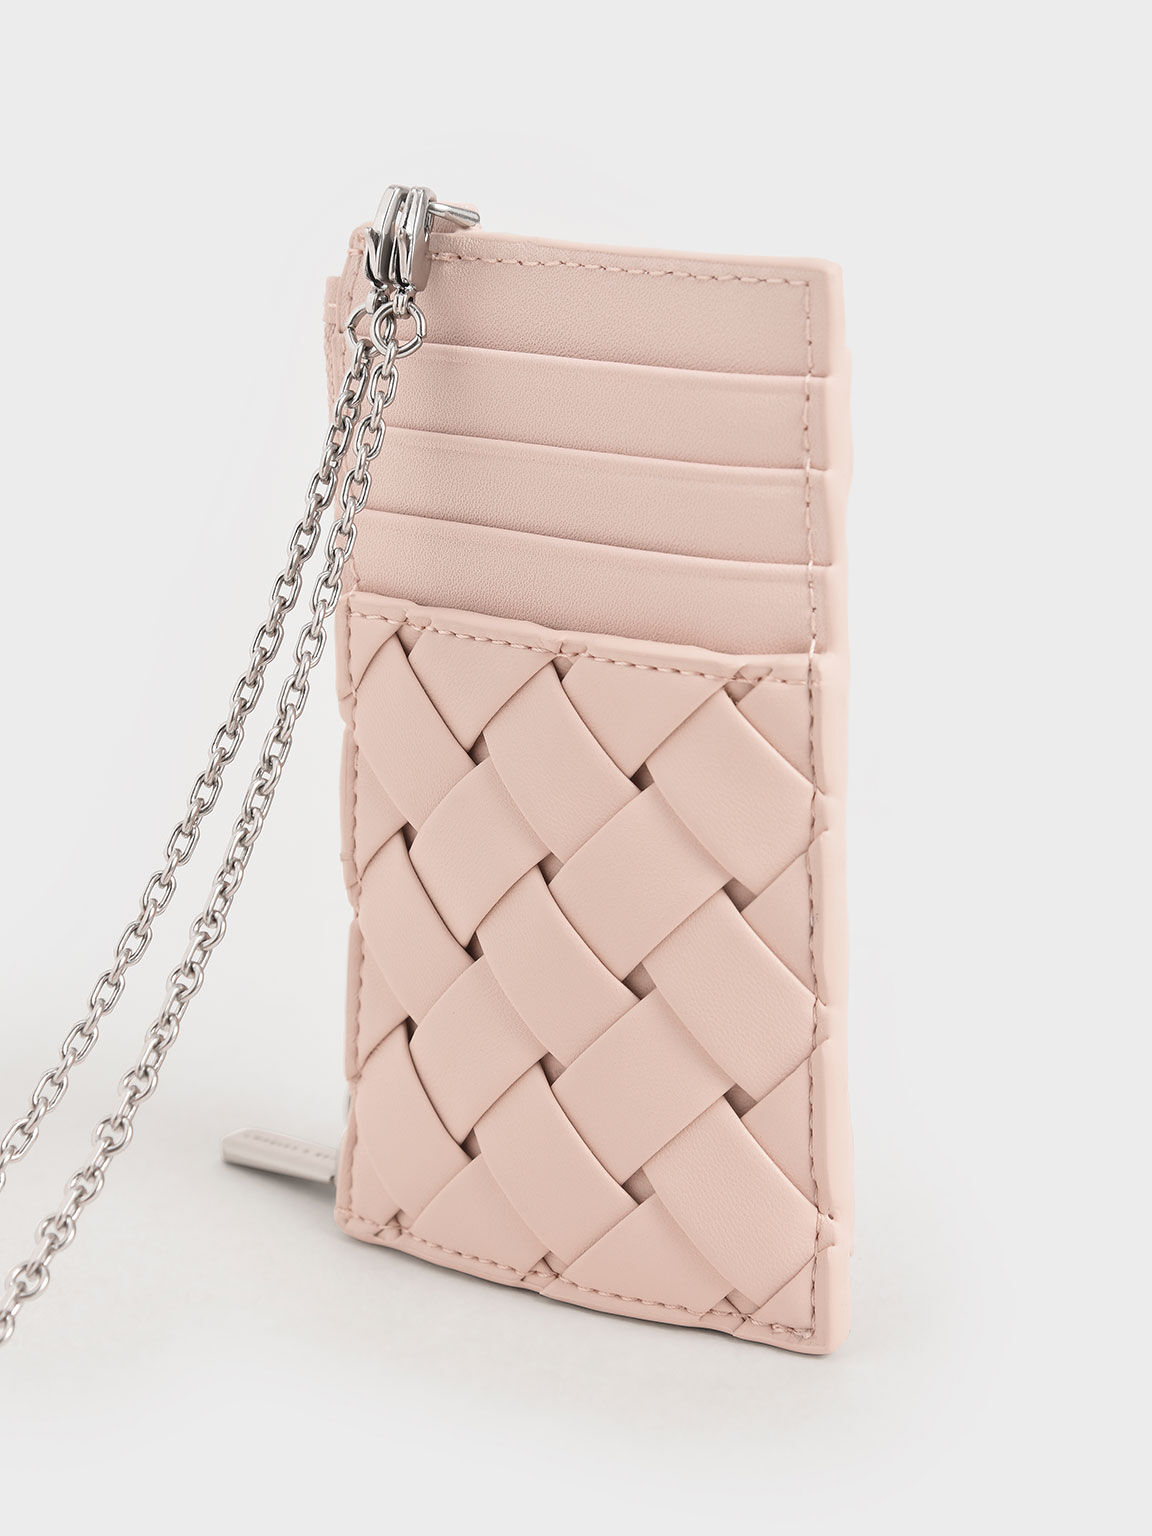 Woven Multi-Slot Card Holder, Light Pink, hi-res